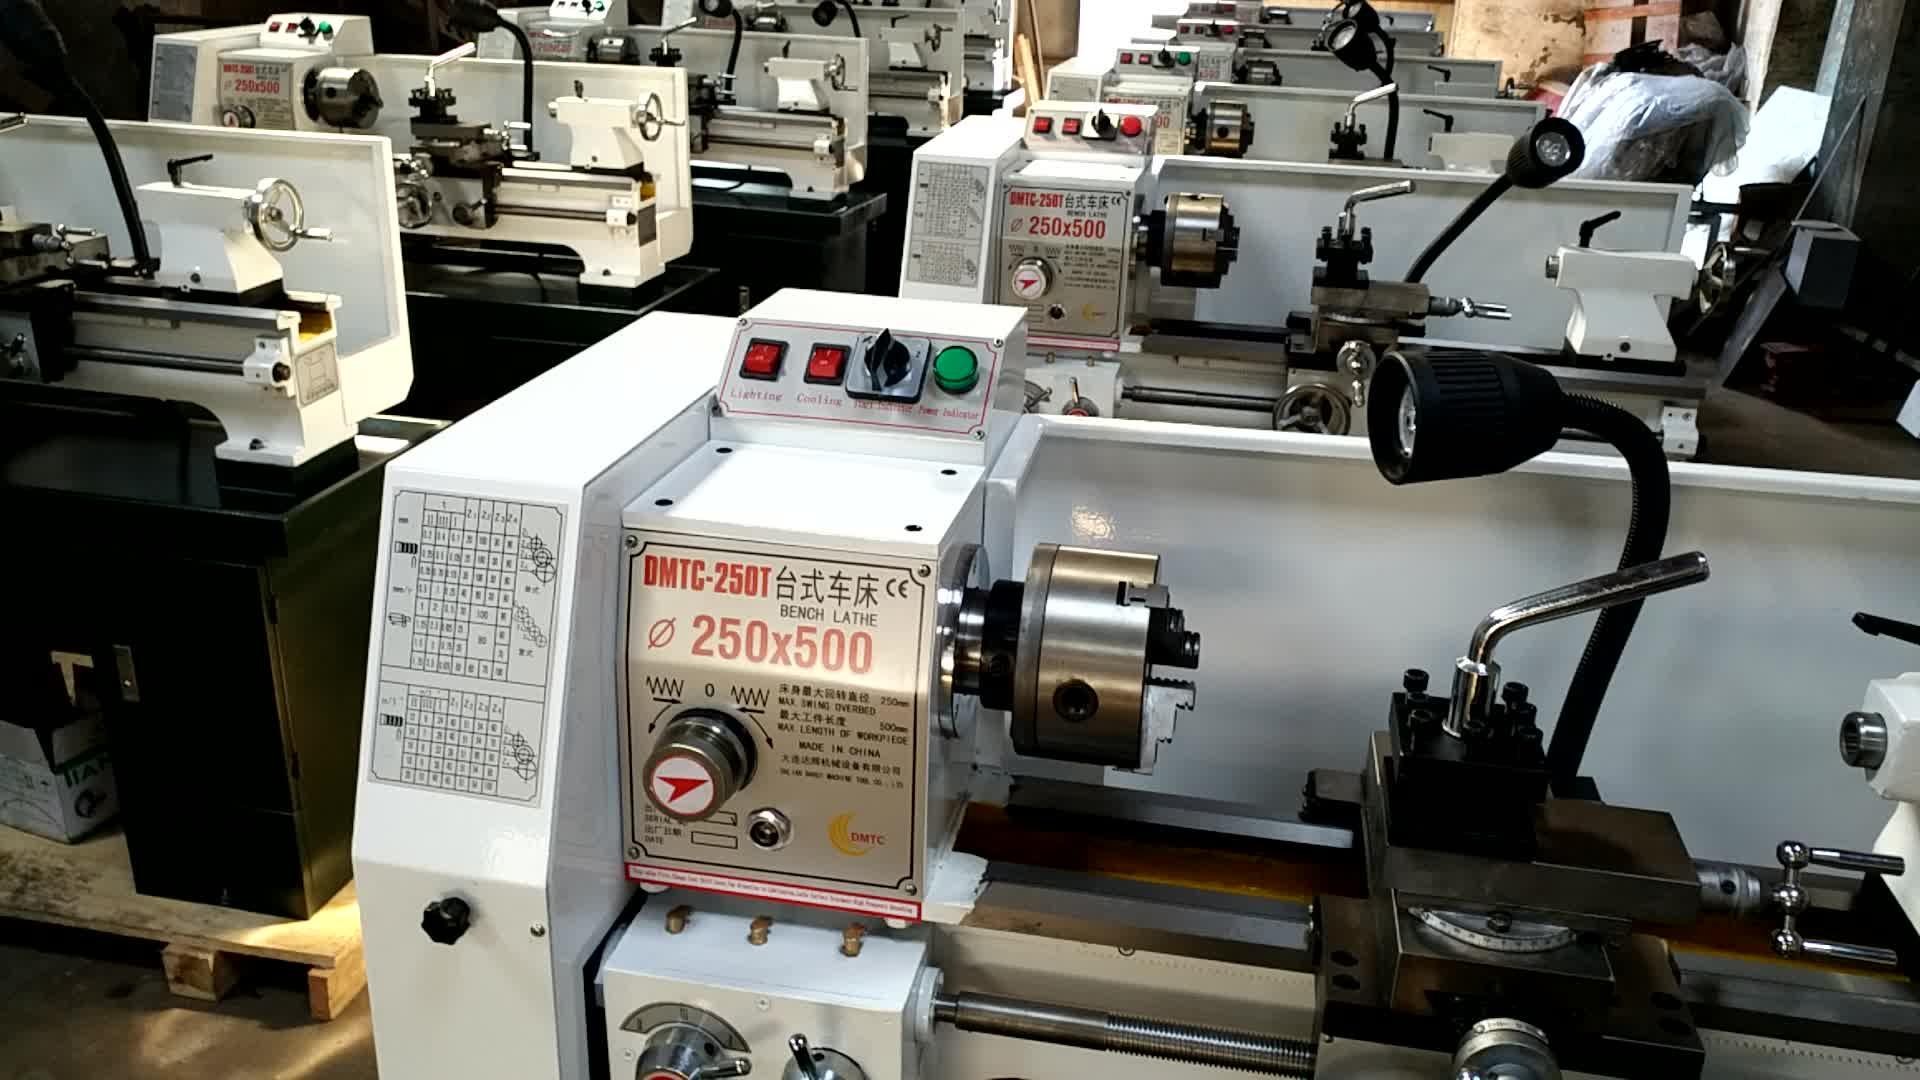 DMTC-250T China Supplier  High Precision Mini Lathe Bench Lathe Desktop lathe